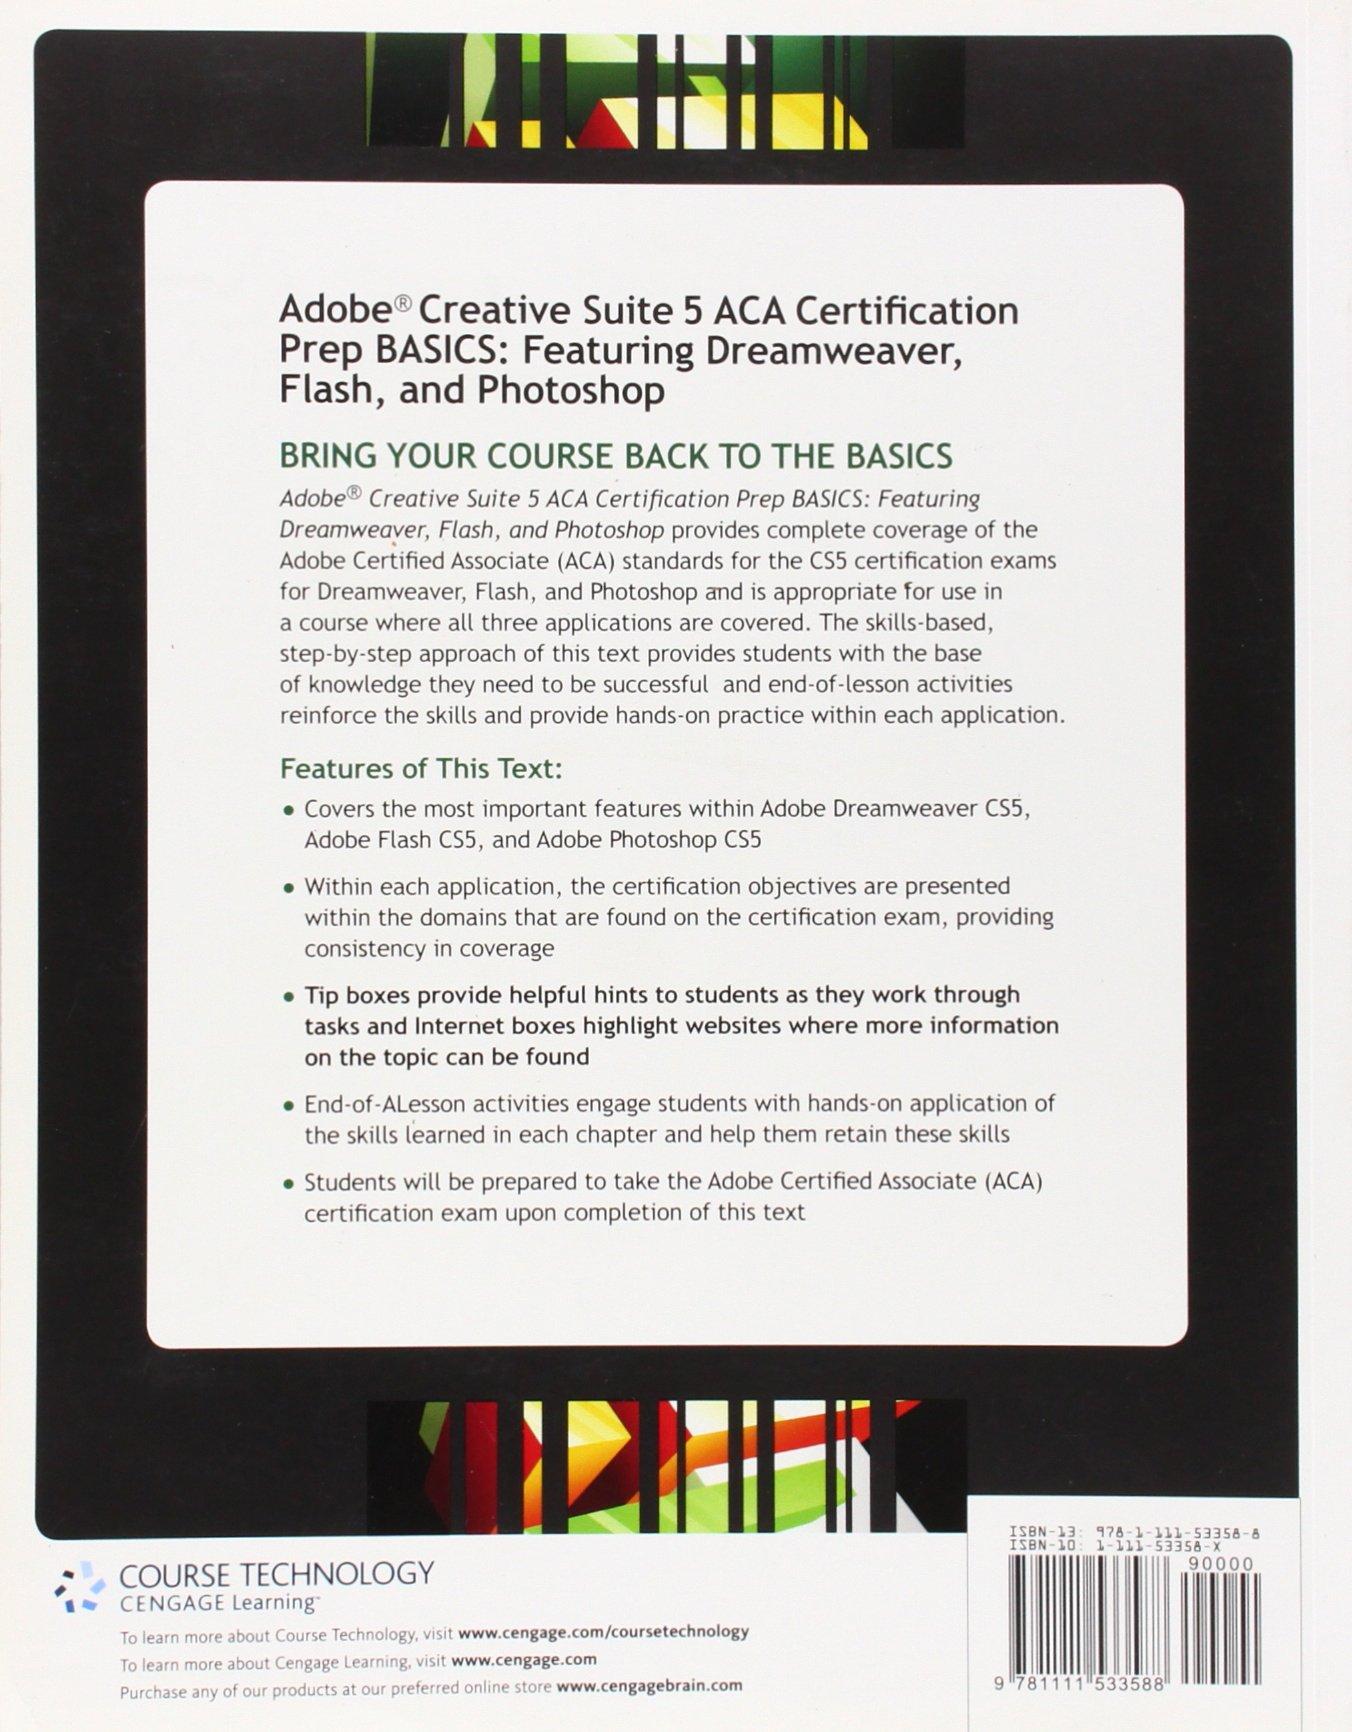 Adobe Creative Suite 5 Aca Certification Preparation Featuring